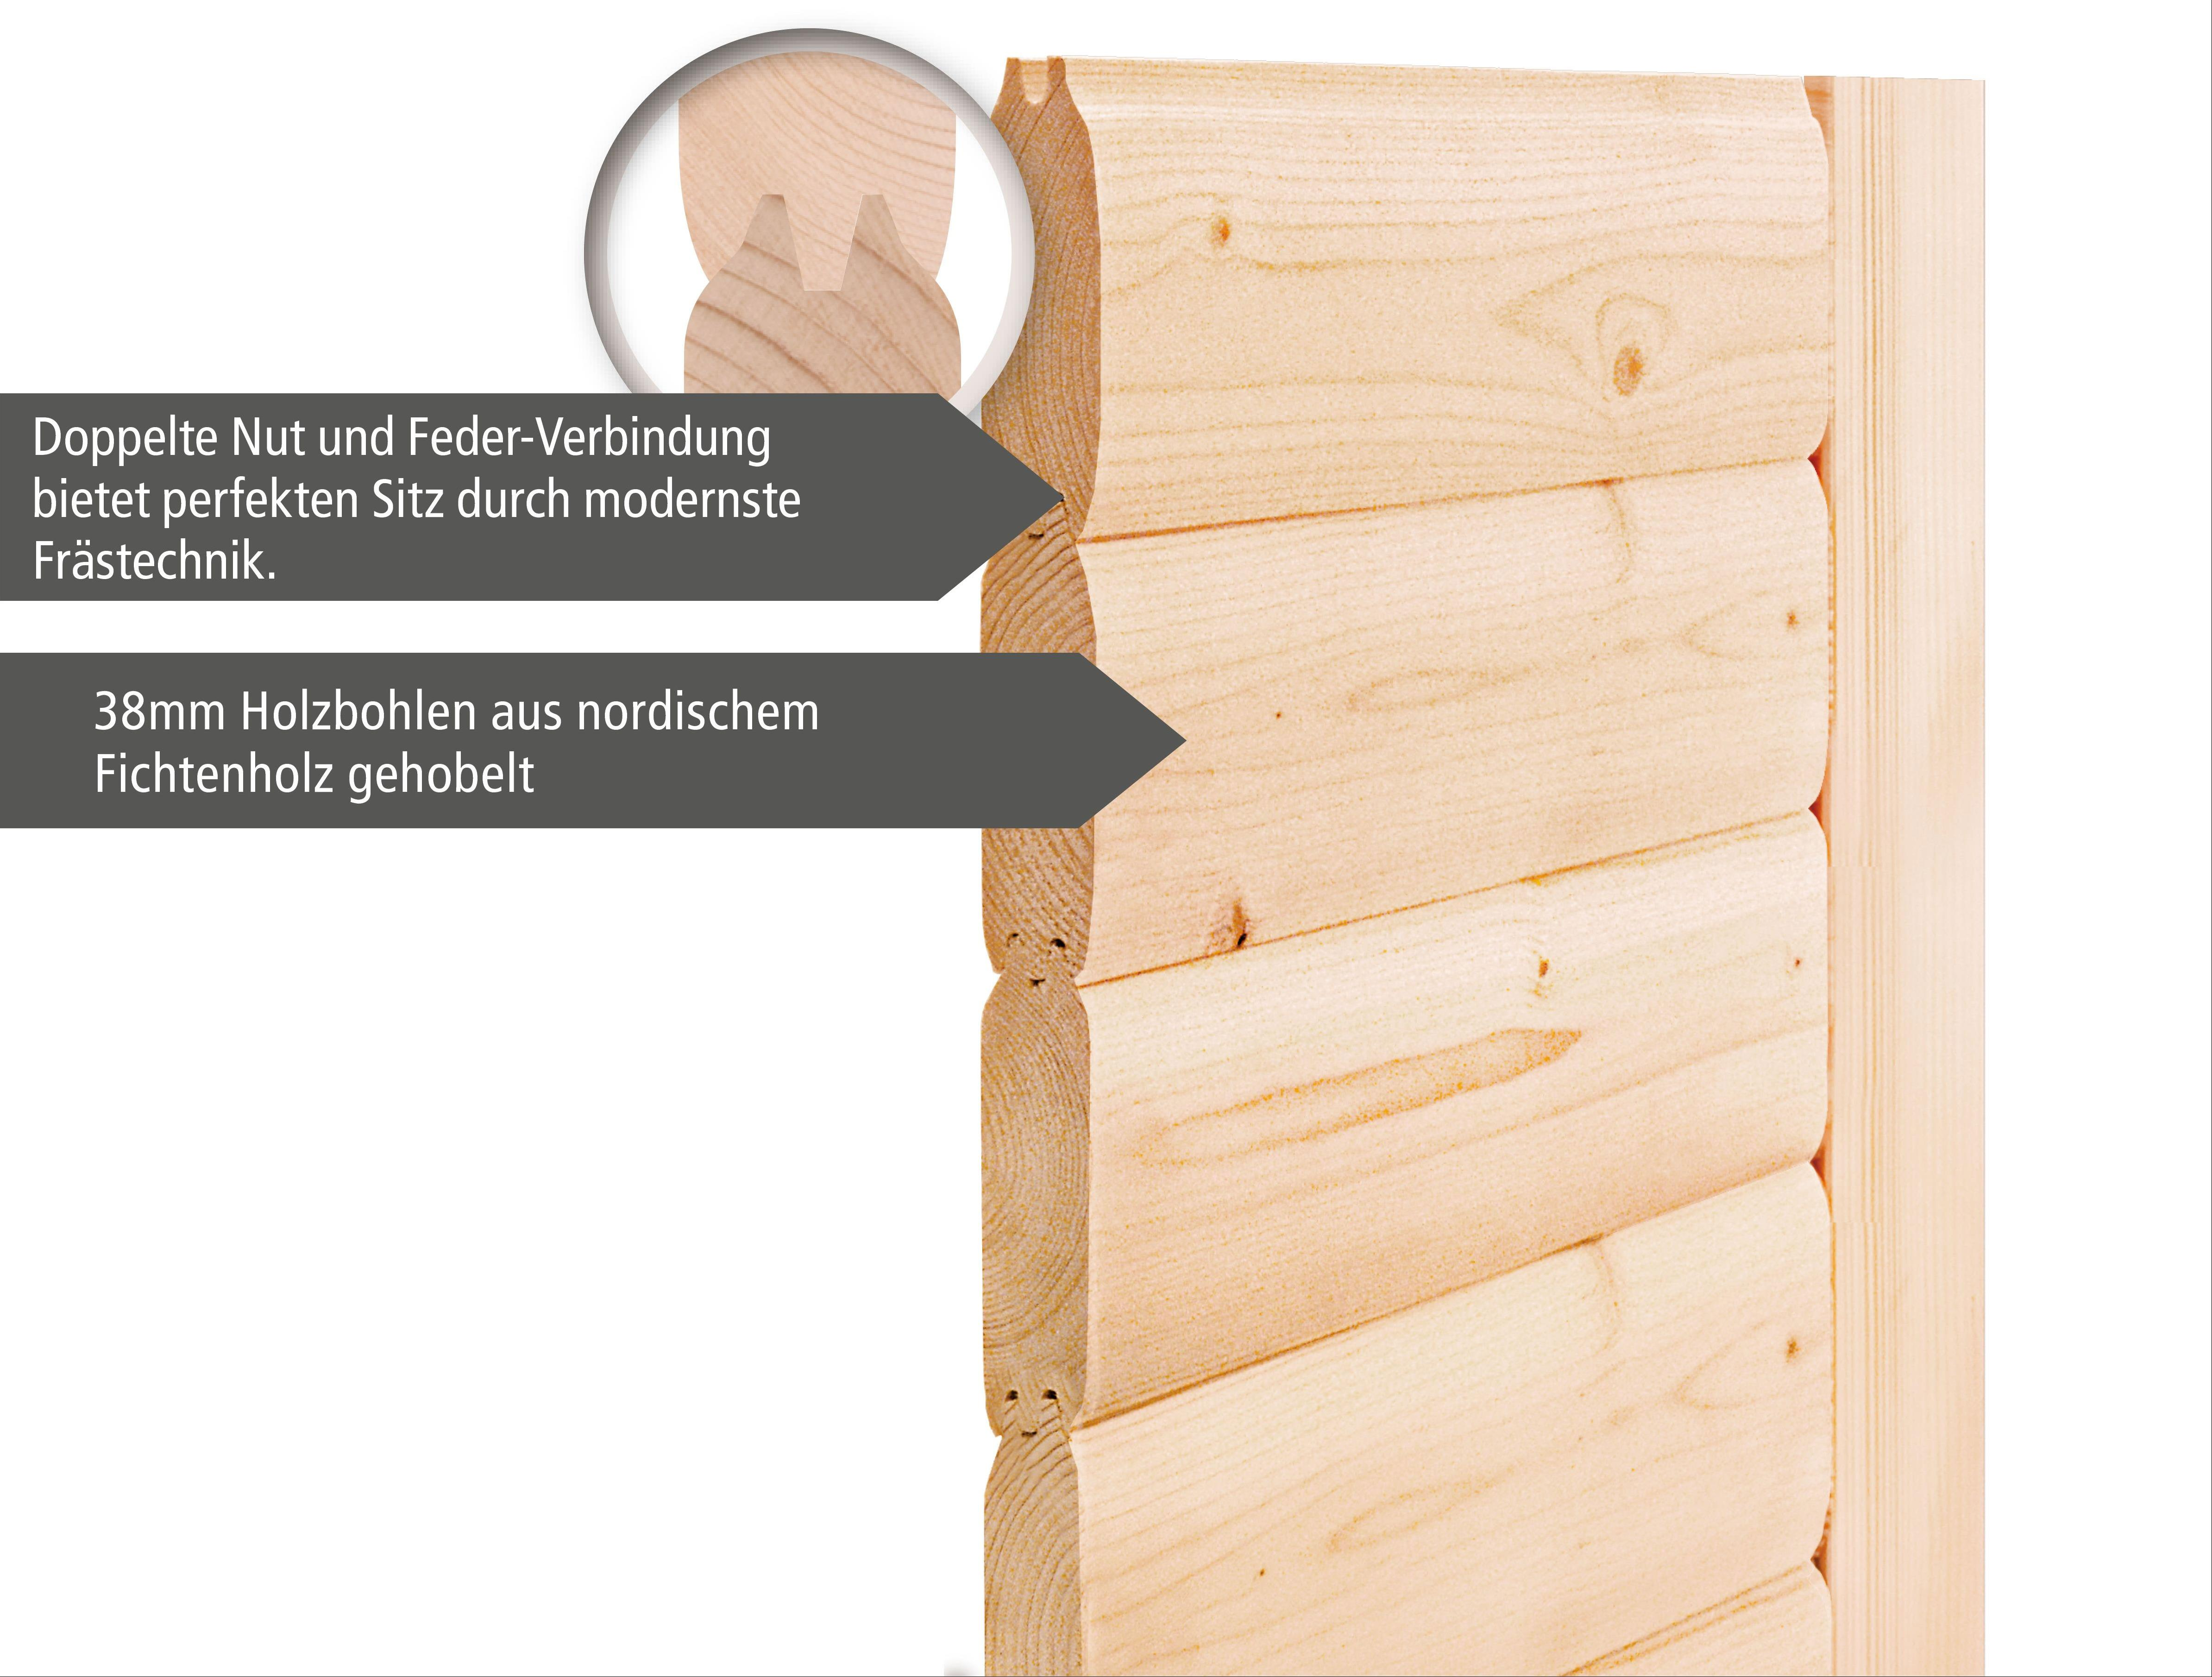 WoodFeeling Sauna Svea 38mm mit Saunaofen 9 kW extern Klarglas Tür Bild 5